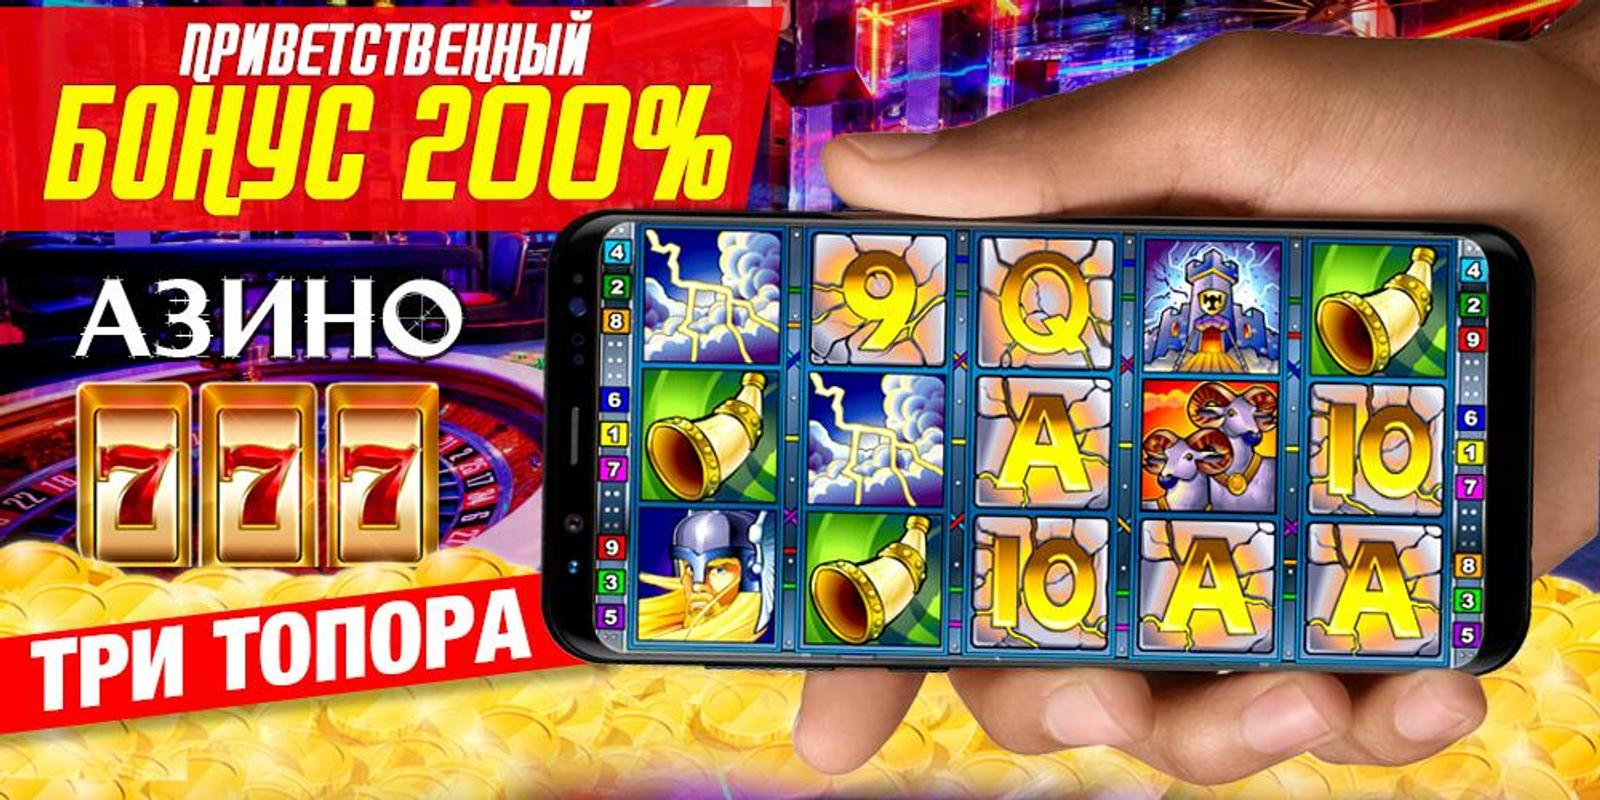 Казино Три Топора Азино 3 Топора - лучшее онлайн-казино в.